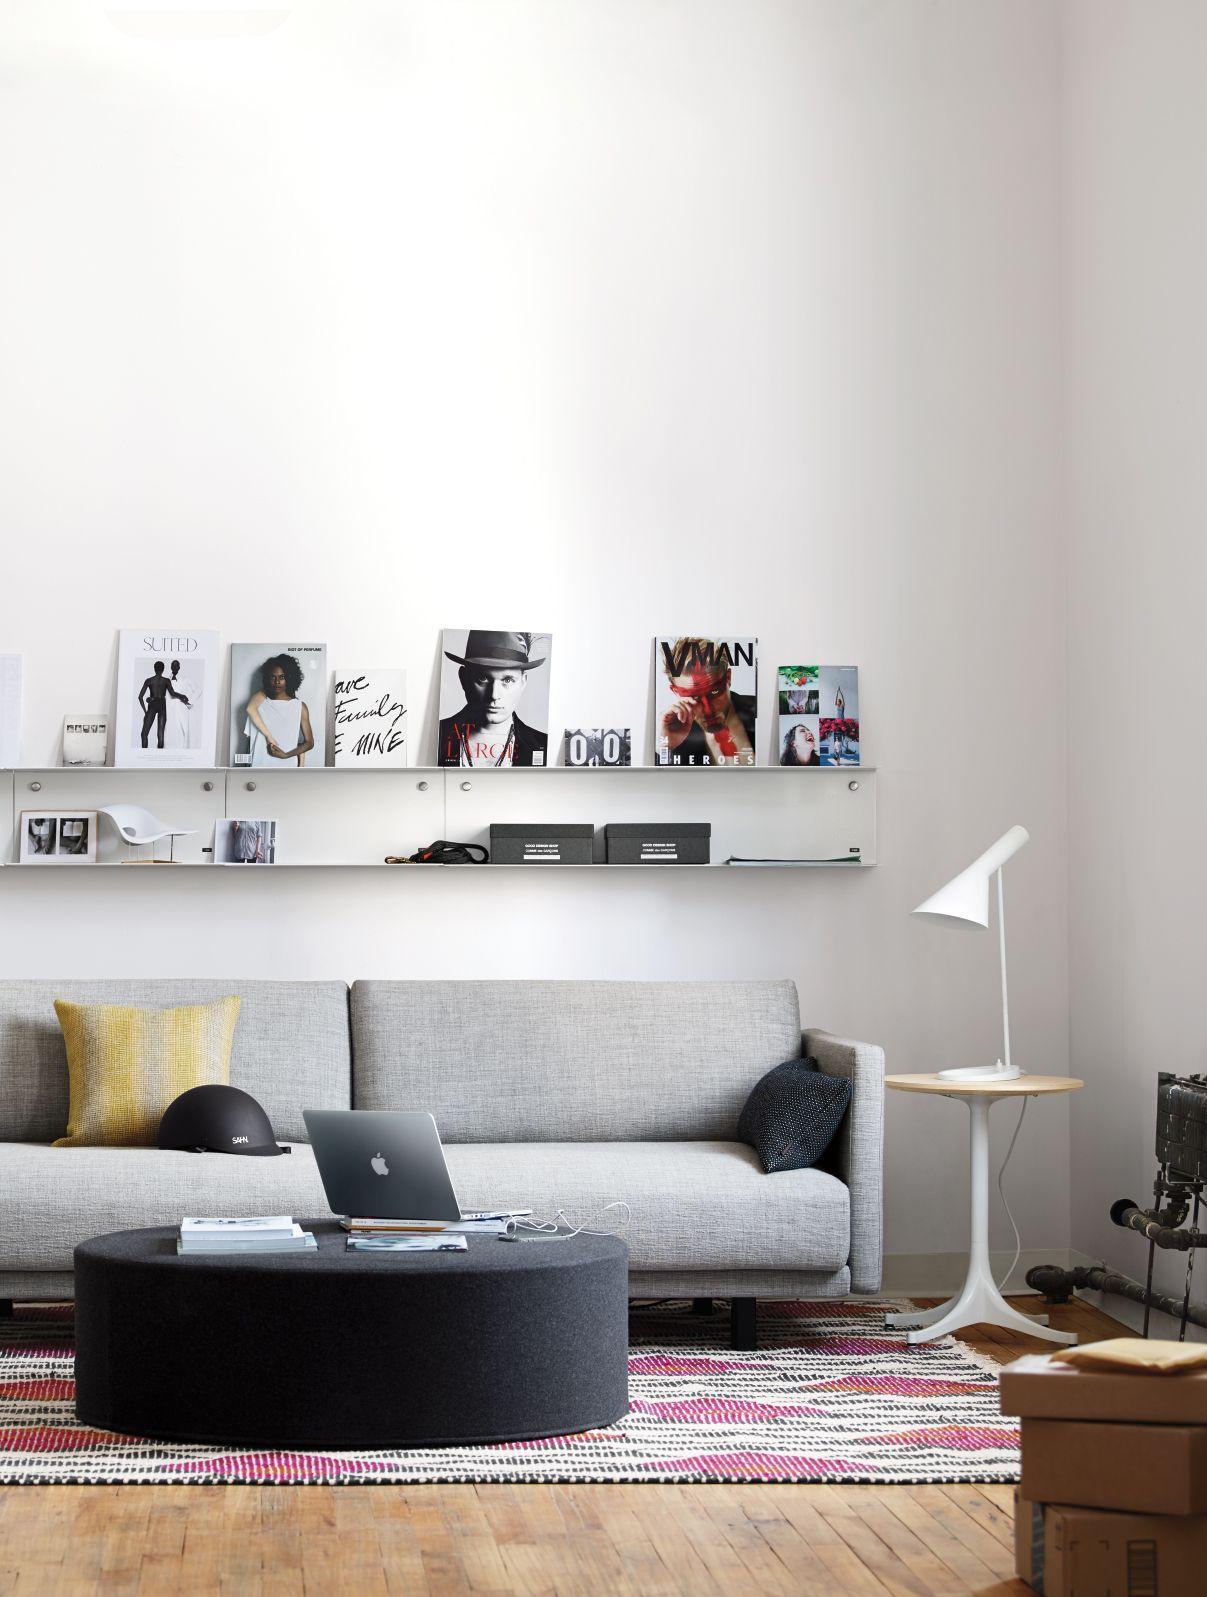 Sofa bed design within reach - Tuck Sleeper Sofa